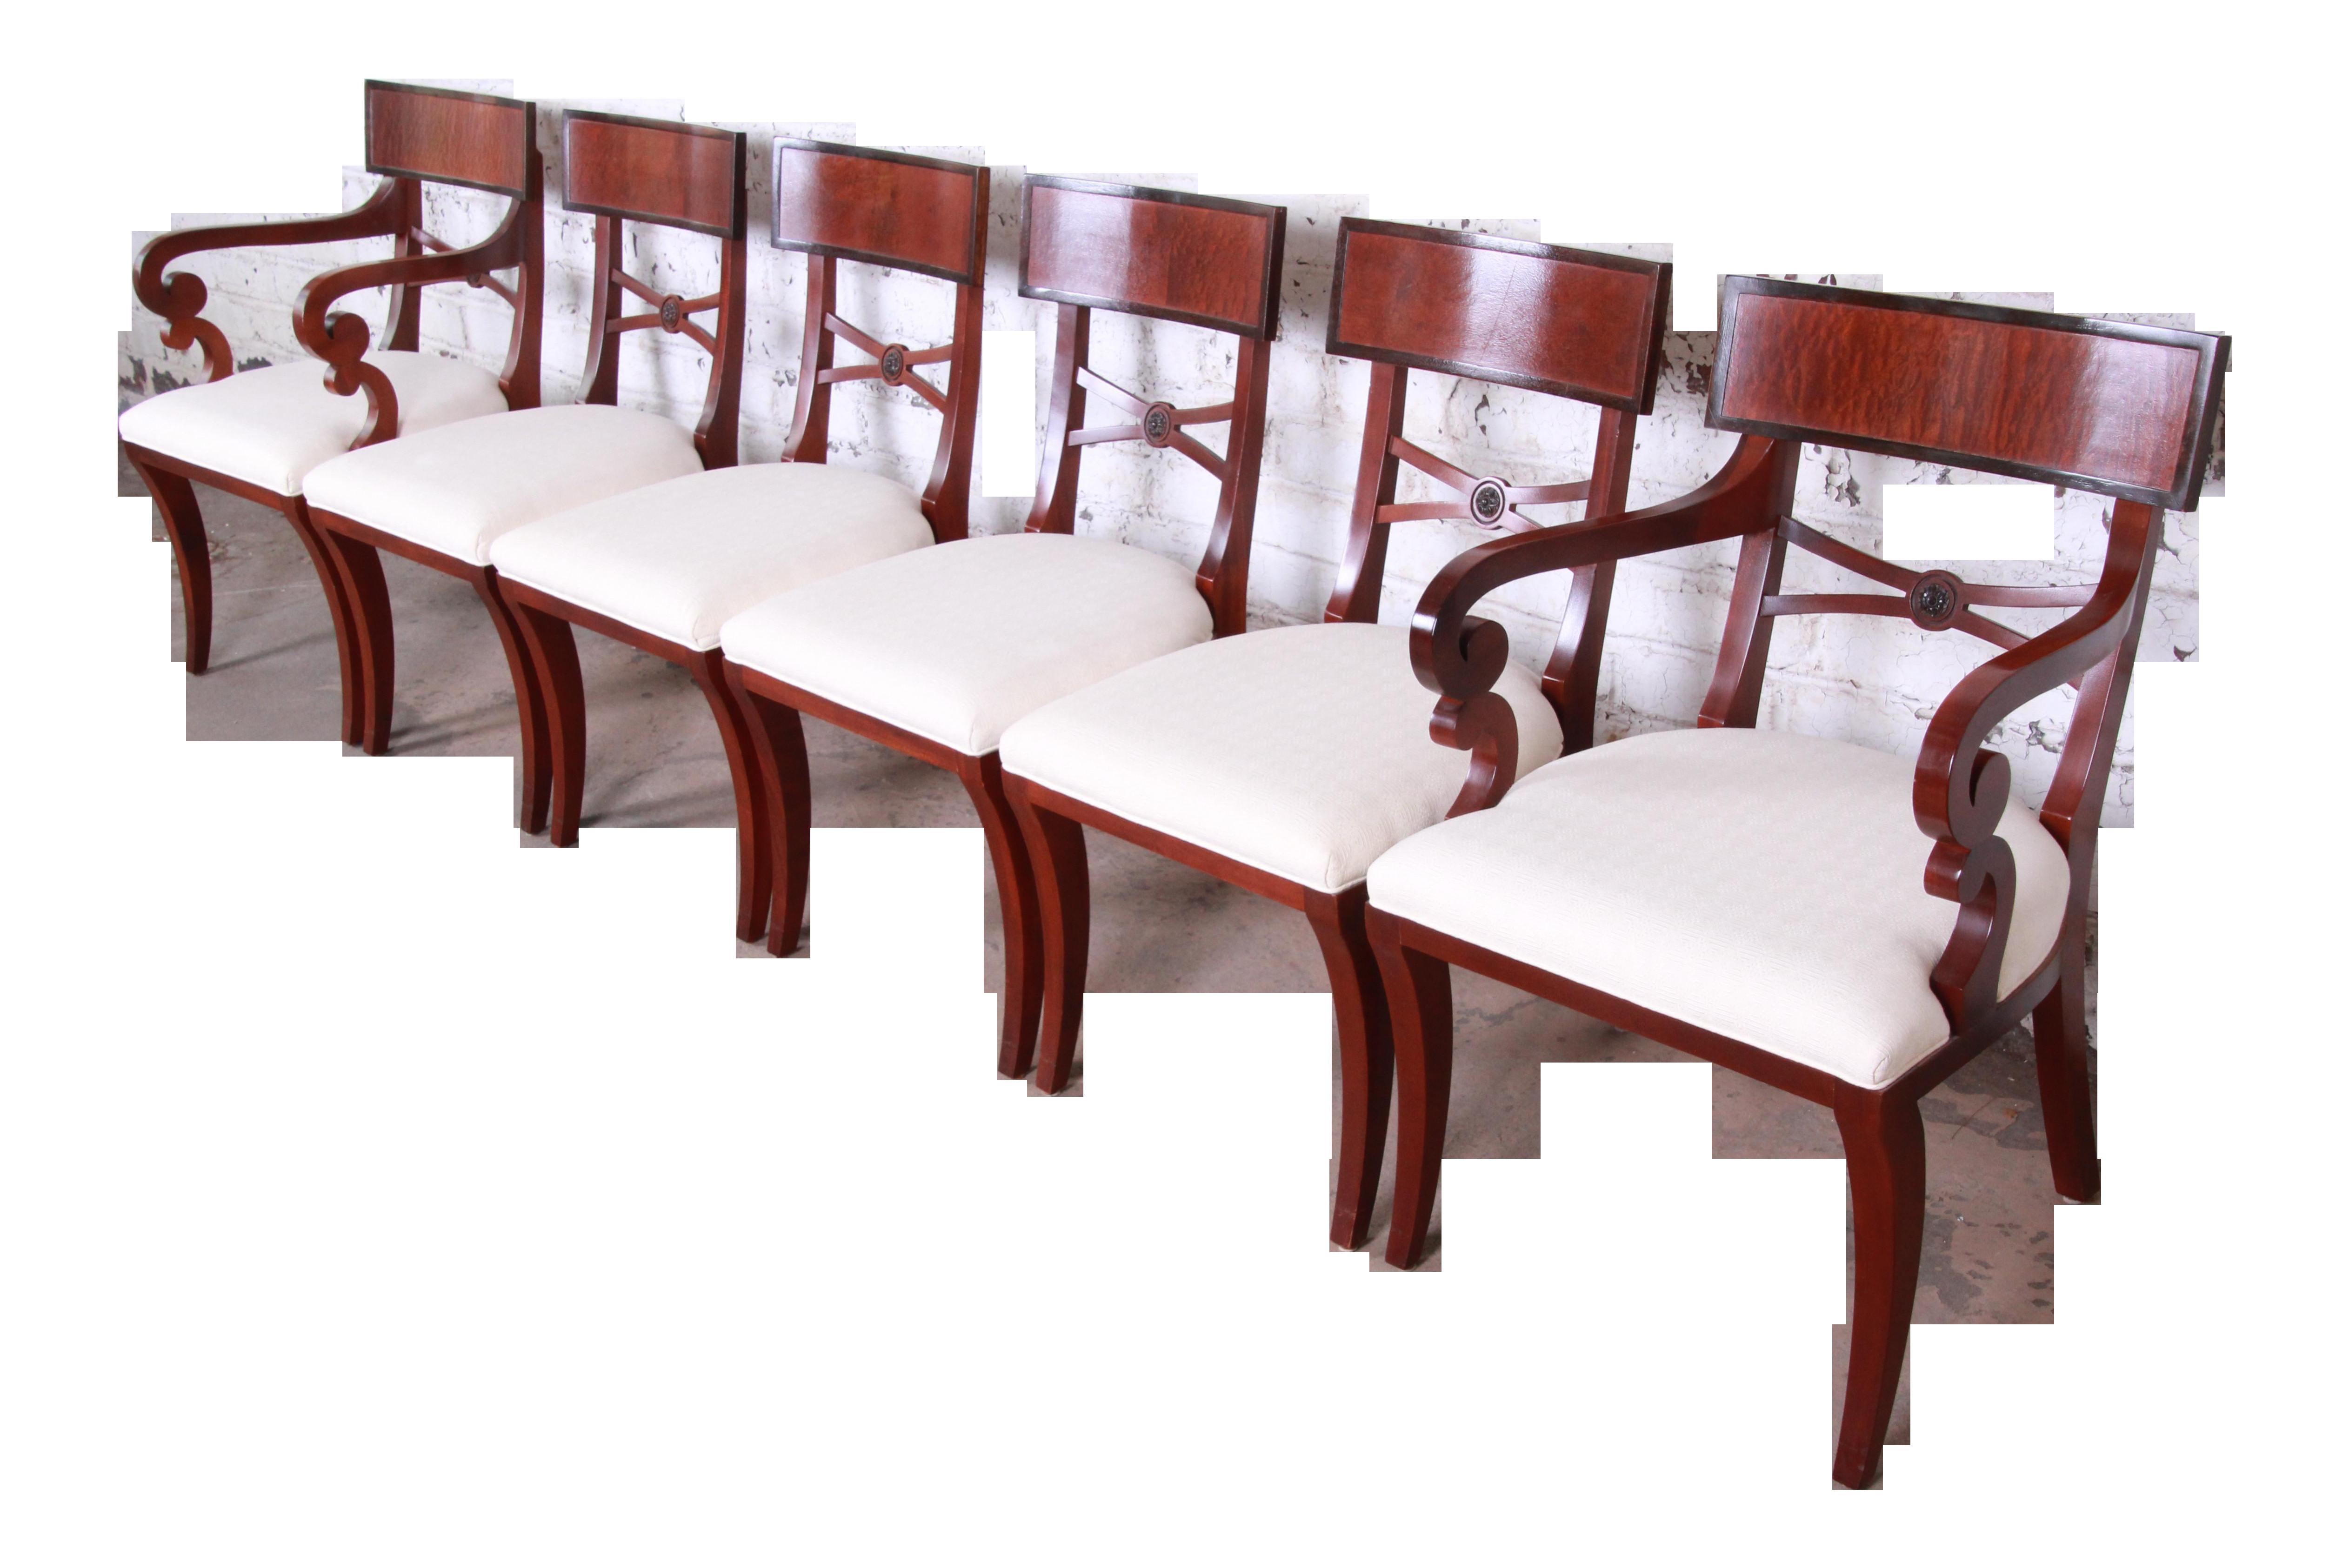 Cool Baker Furniture Regency Mahogany Dining Chairs Set Of 6 Evergreenethics Interior Chair Design Evergreenethicsorg